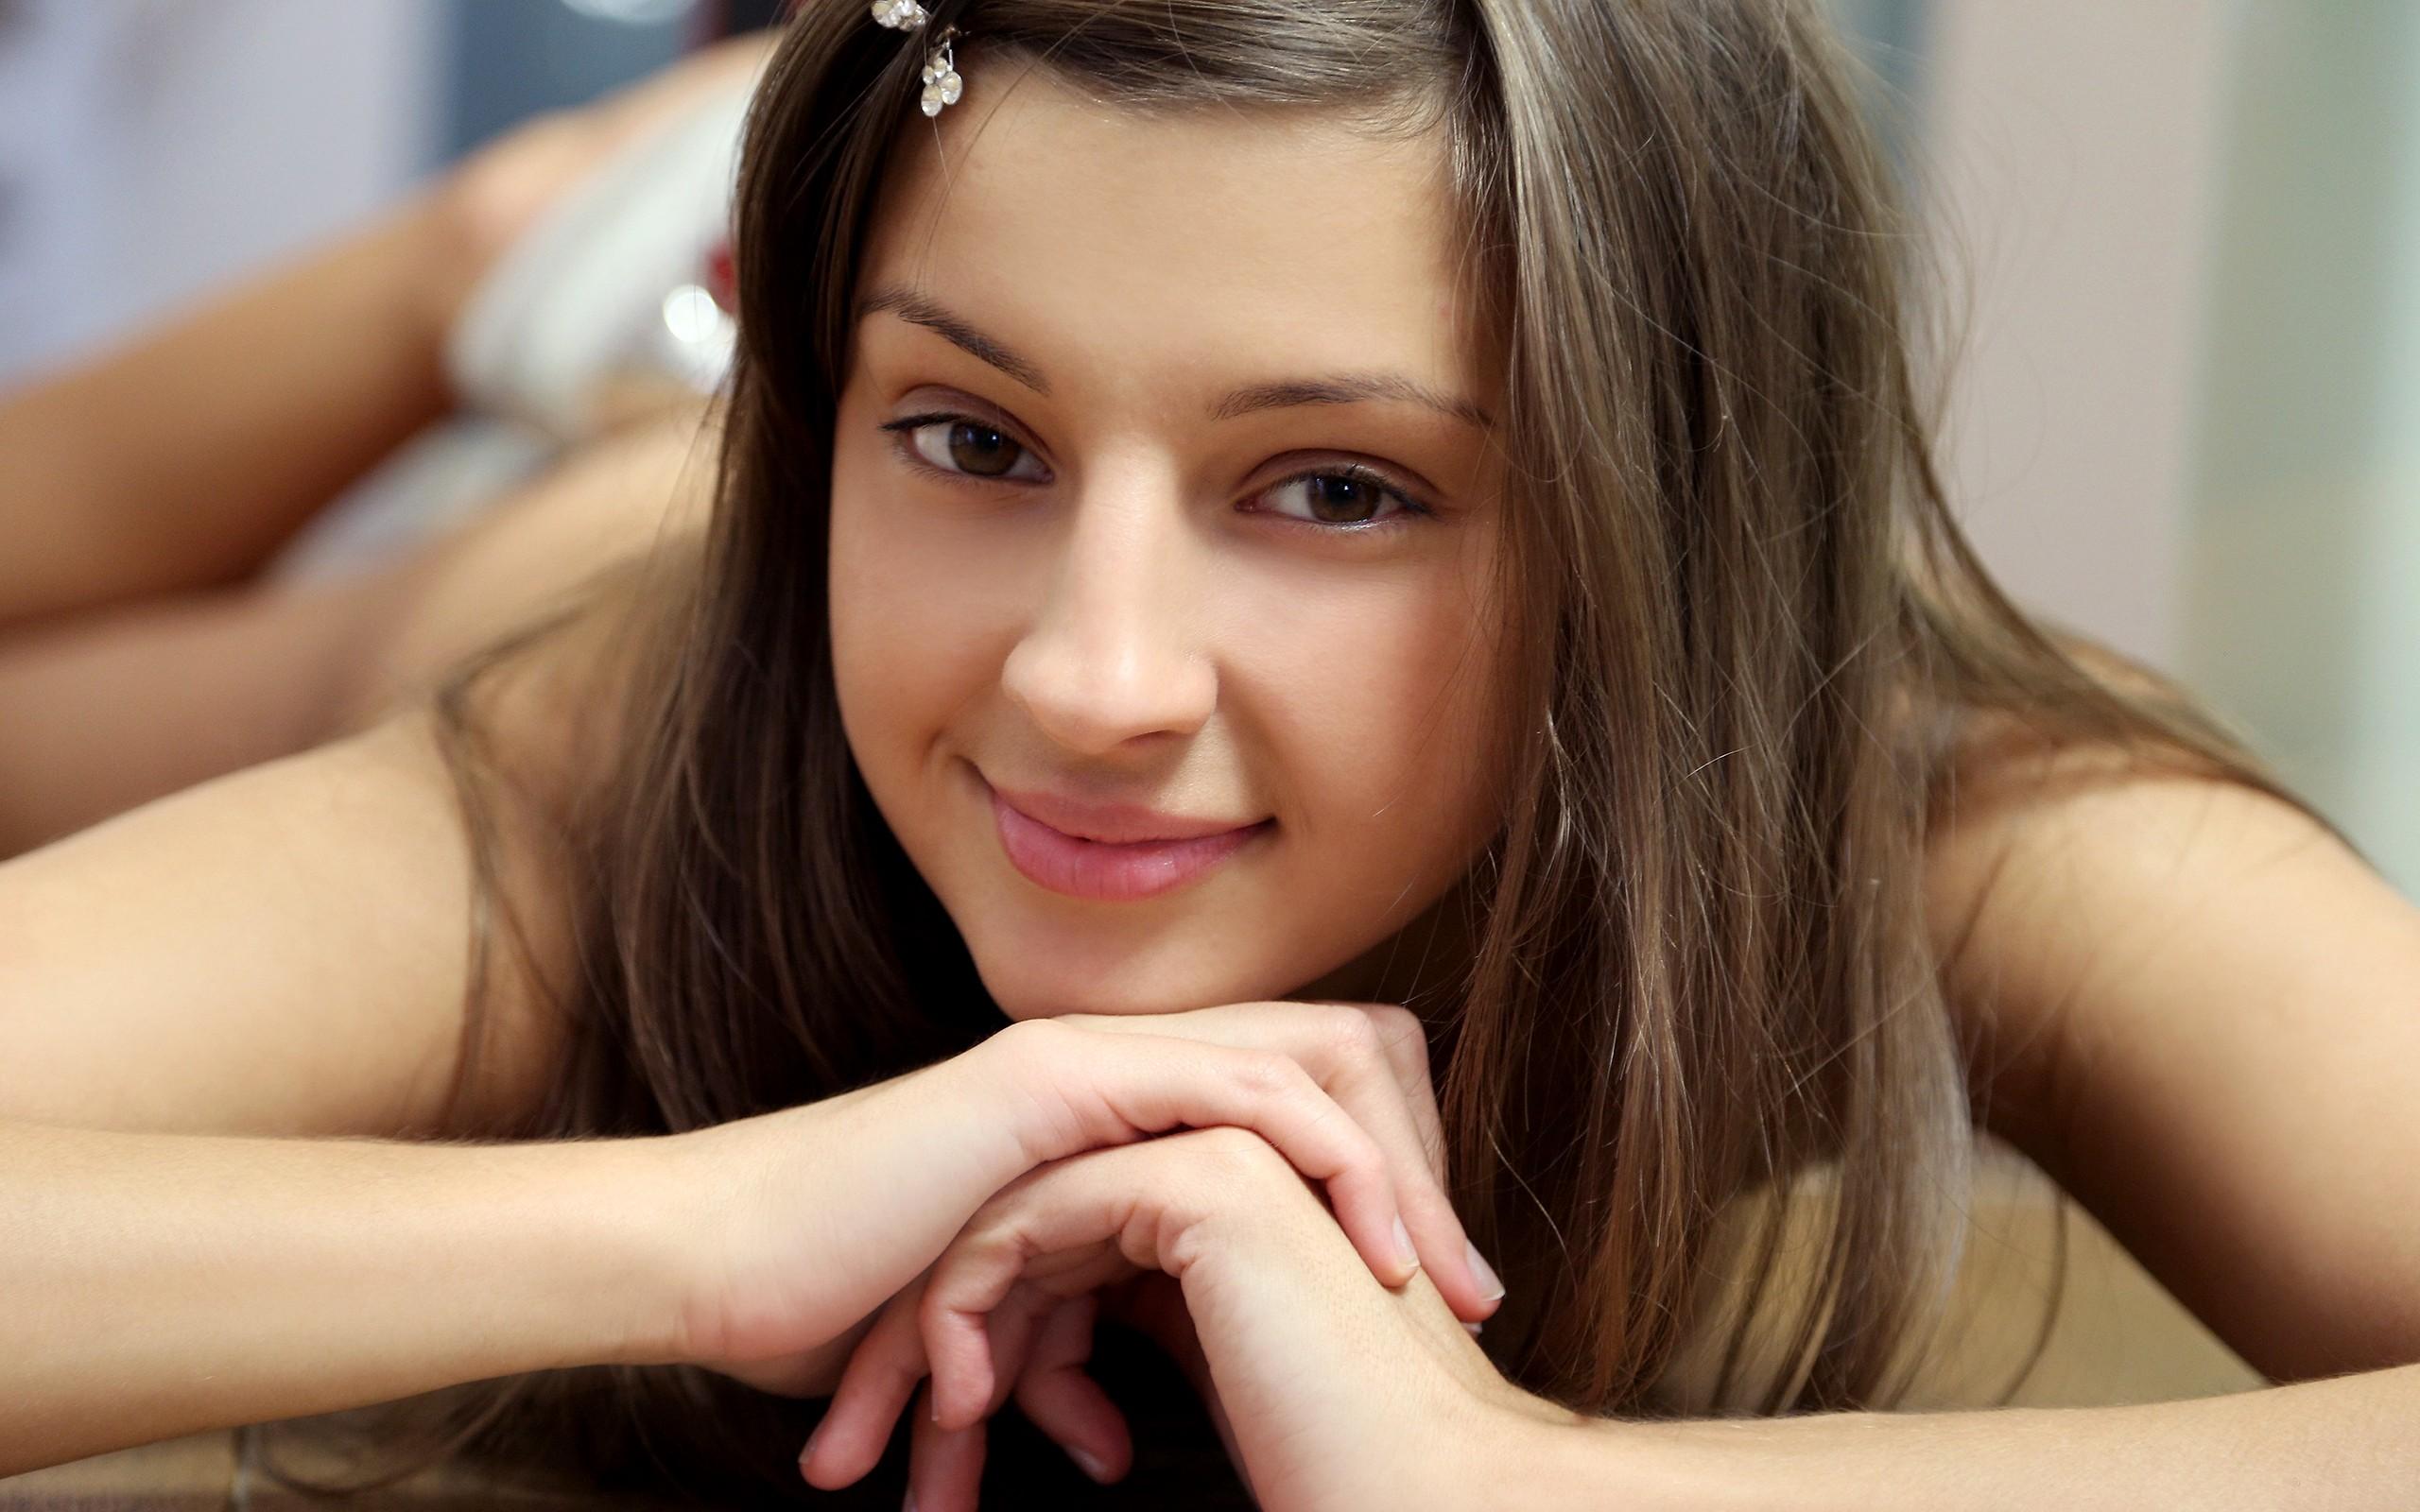 face, Maria Ryabushkina, looking at viewer, girl, brunette